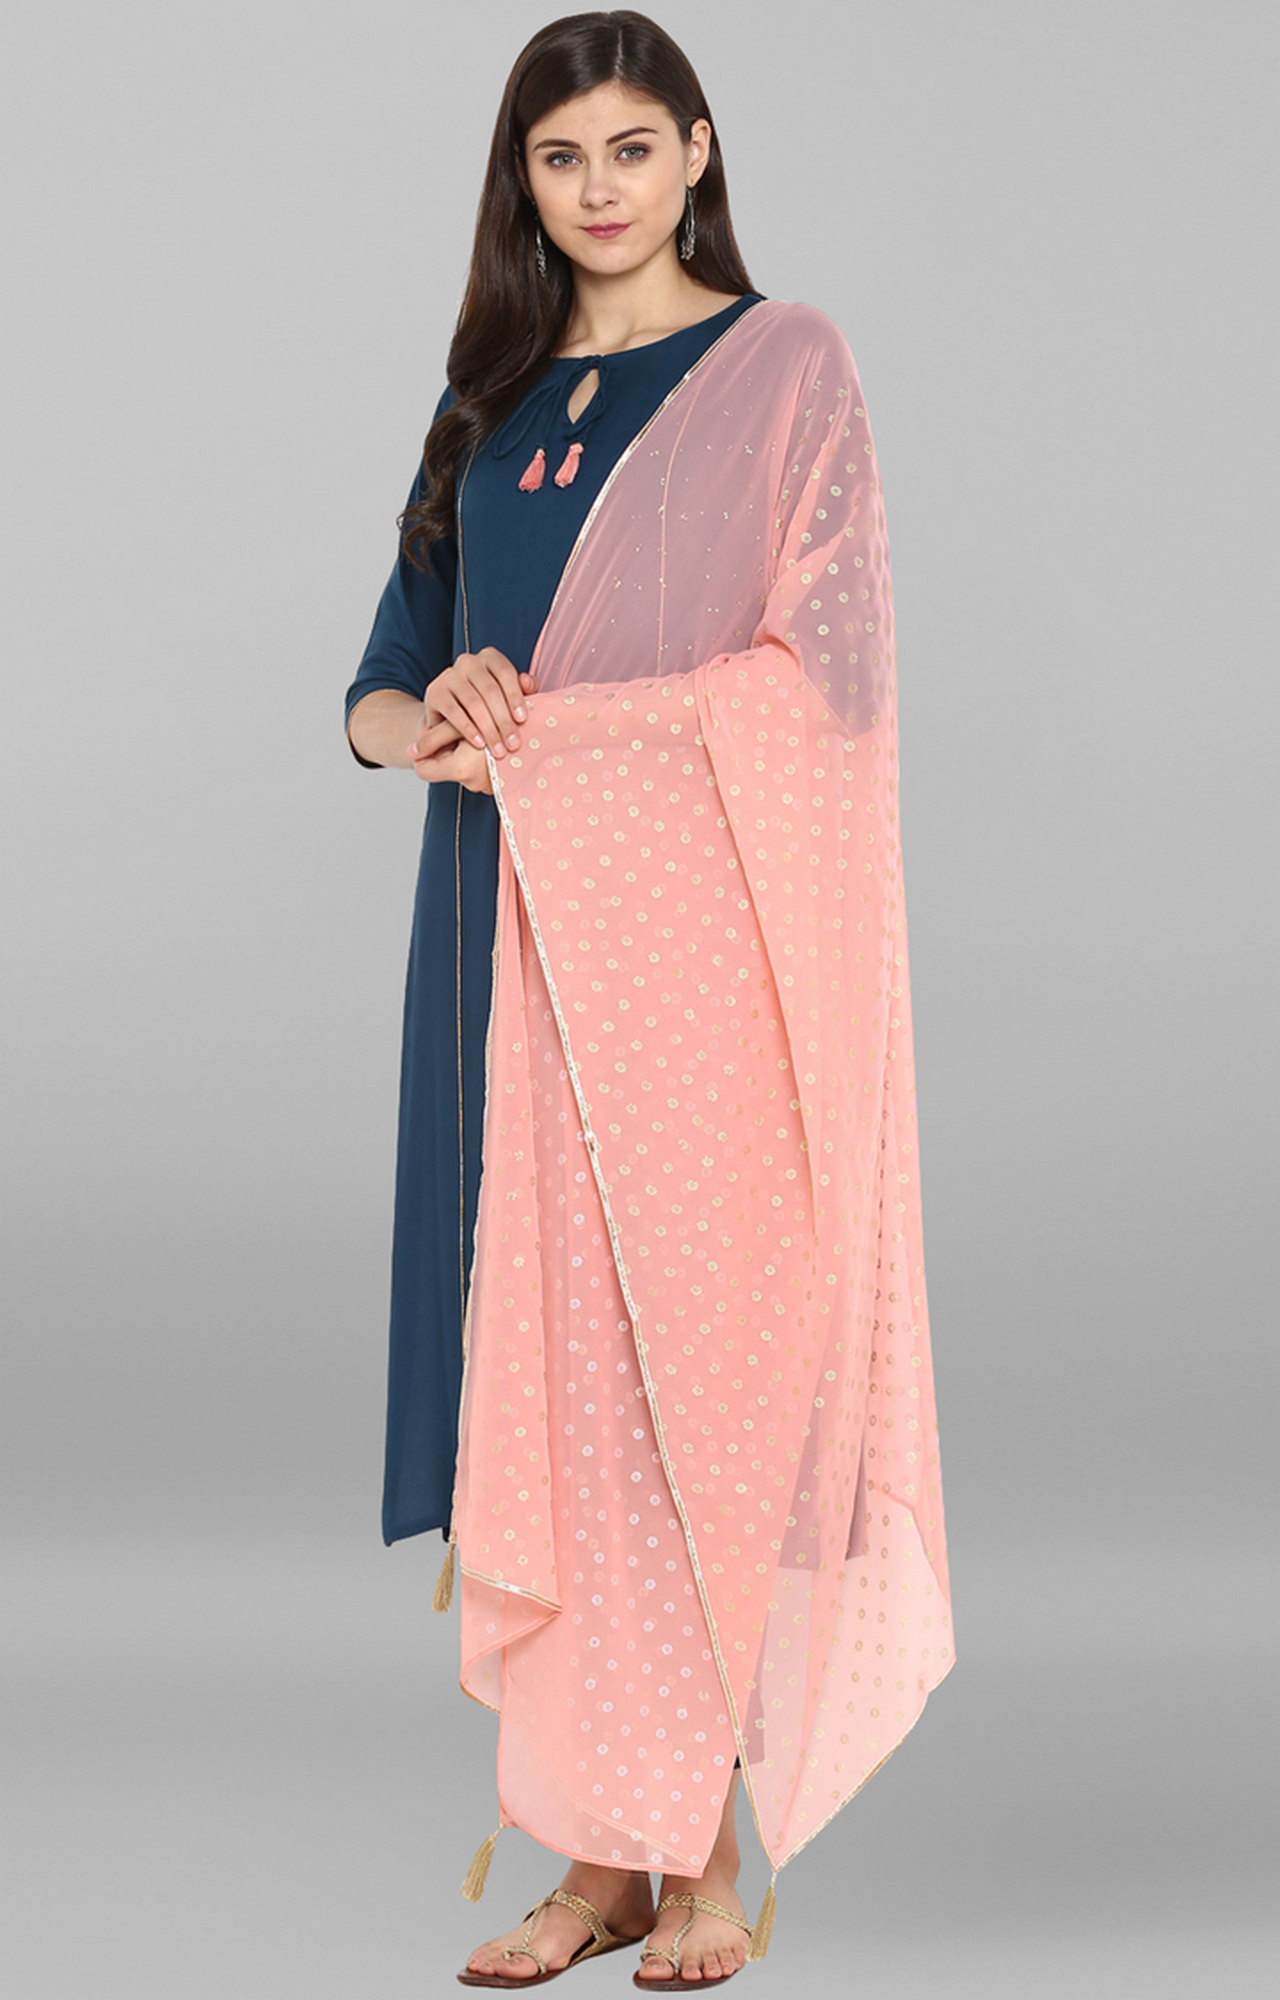 Janasya | Turquoise and Pink Printed Suit Set